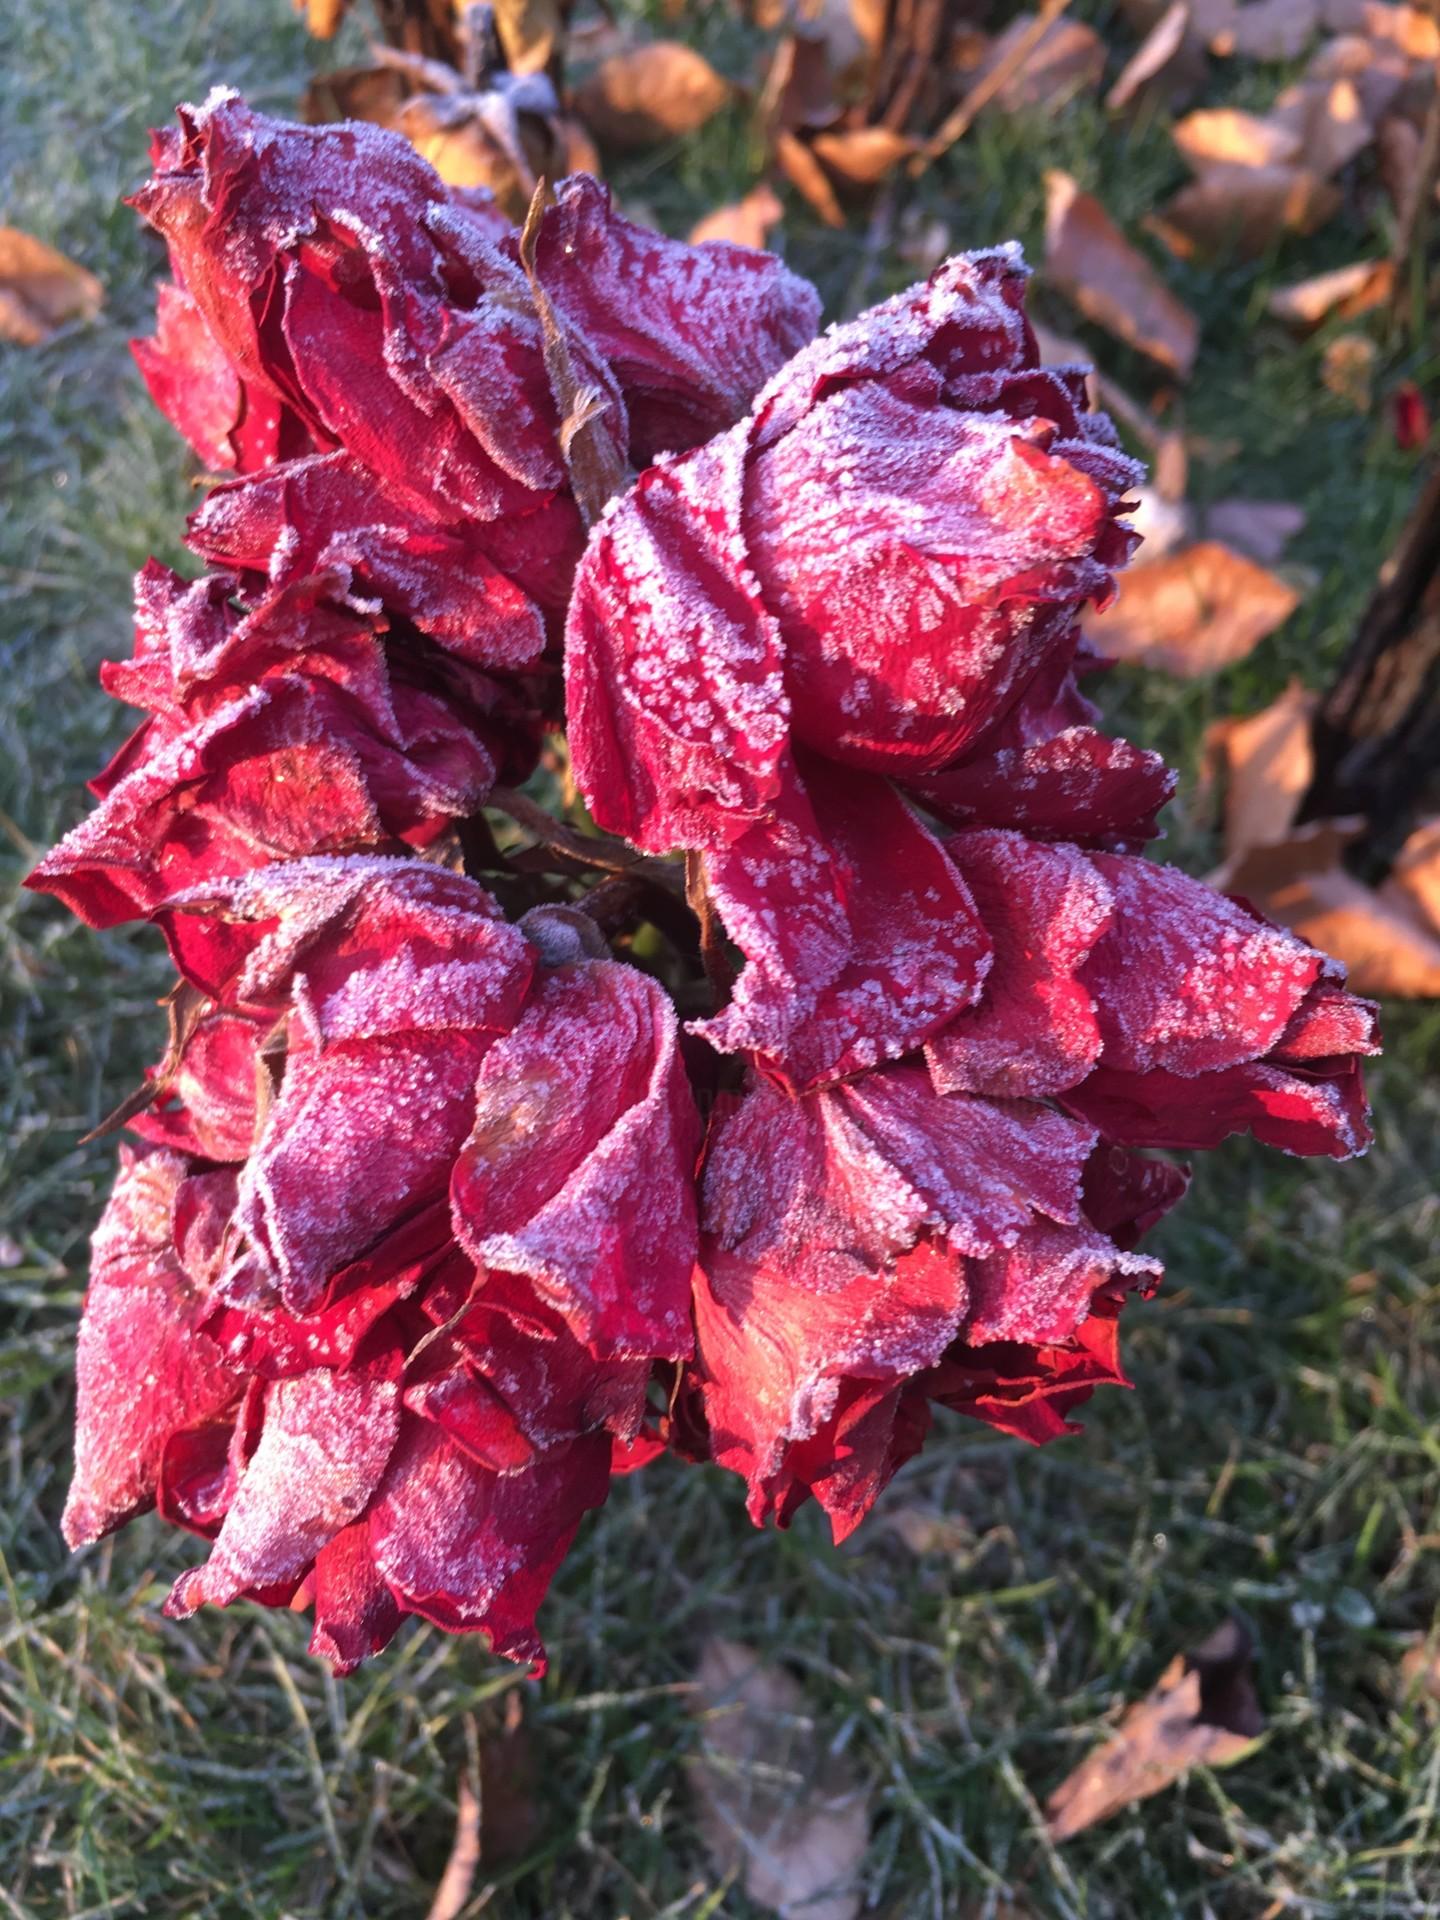 Paul Yves Poumay - roses rouges givrées